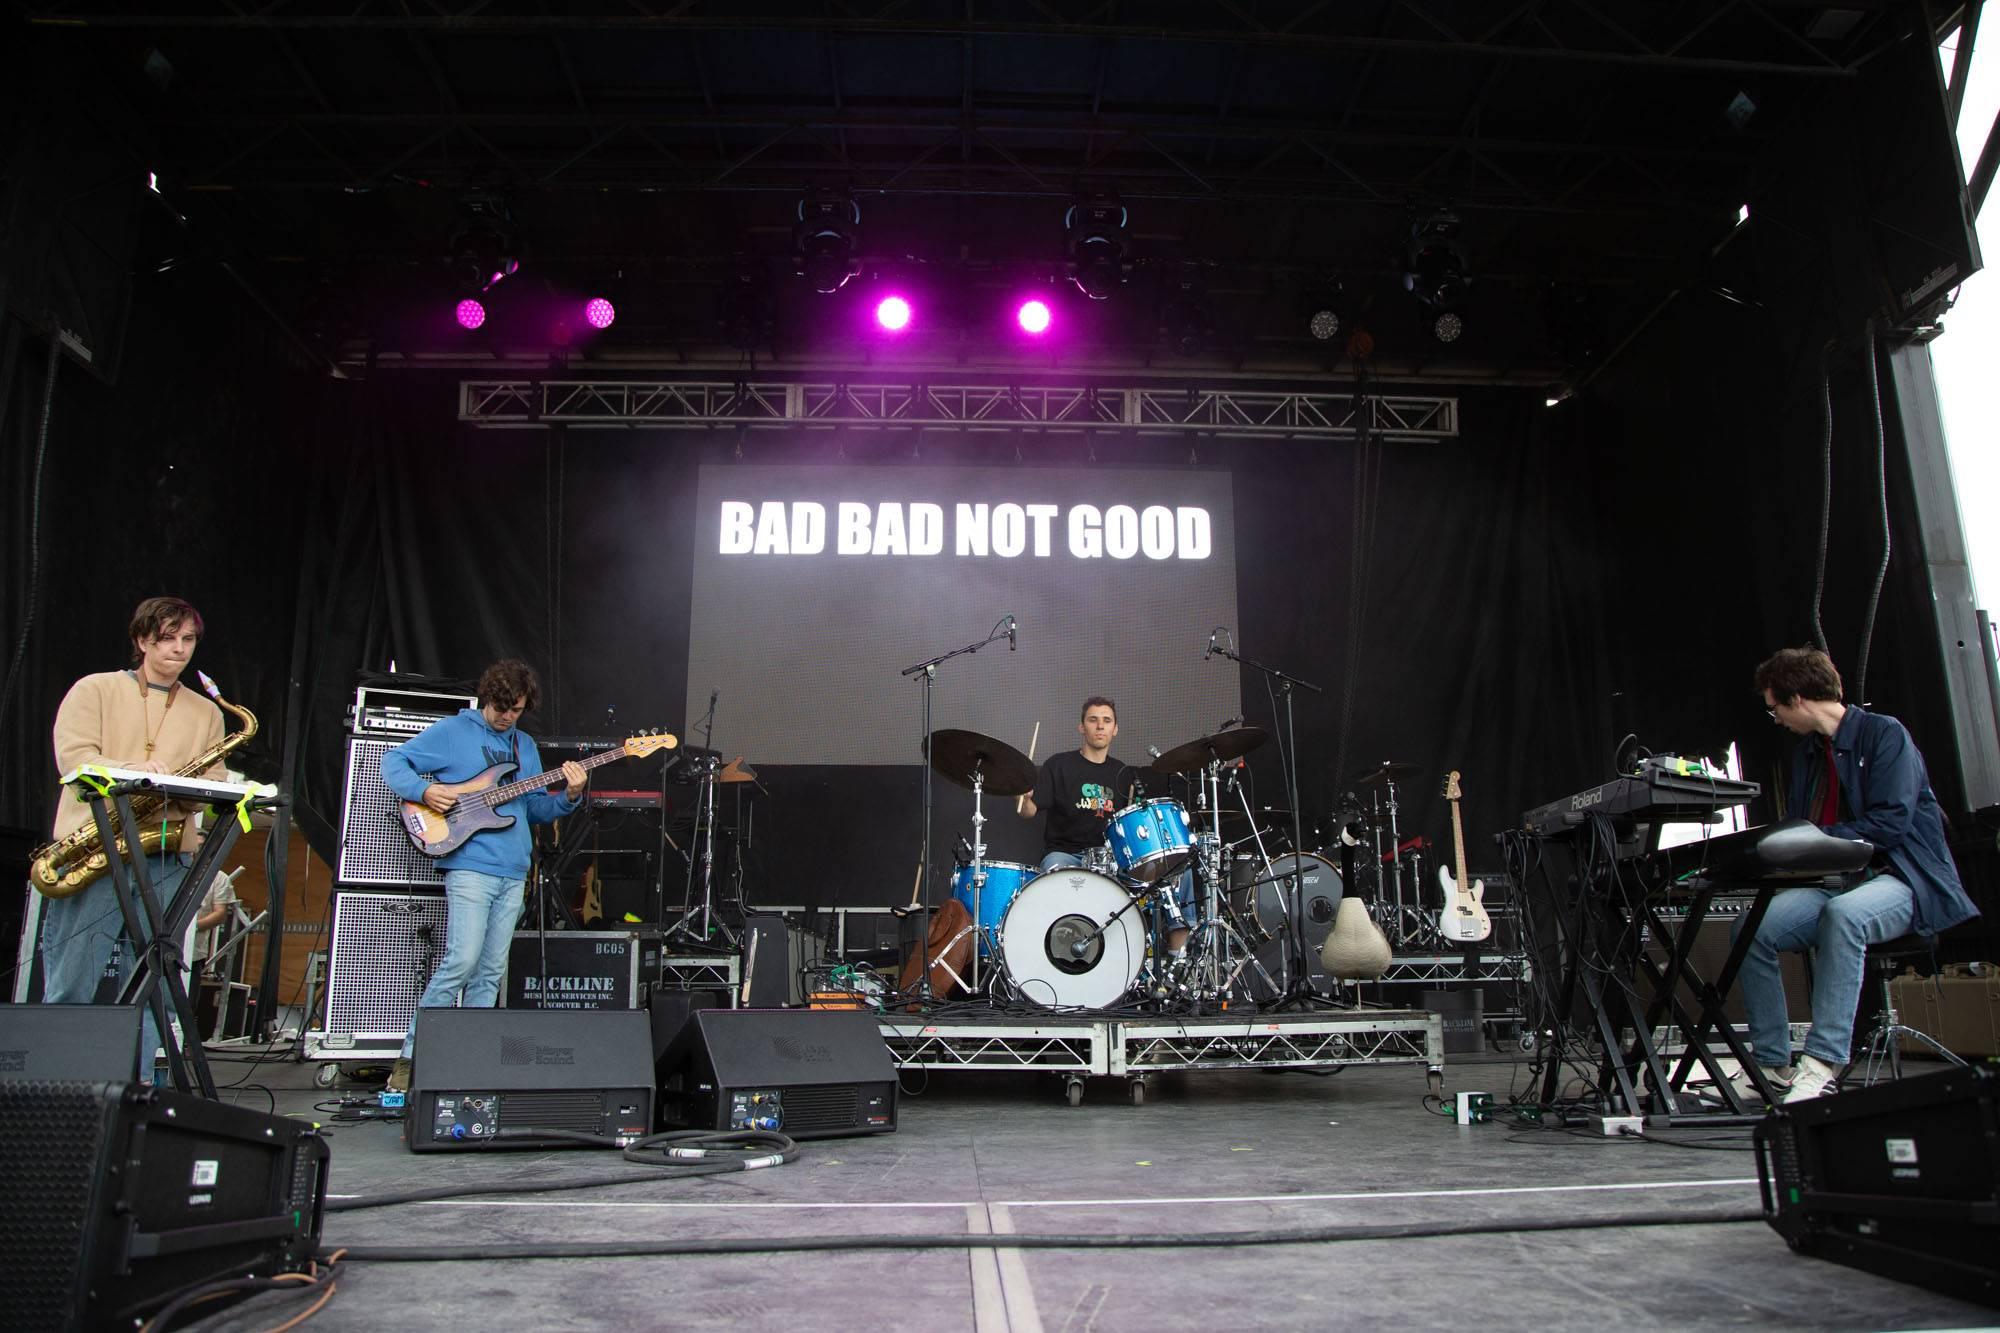 Badbadnotgood at The Park Show, Vancouver, Aug 10 2019. Kirk Chantraine photo.